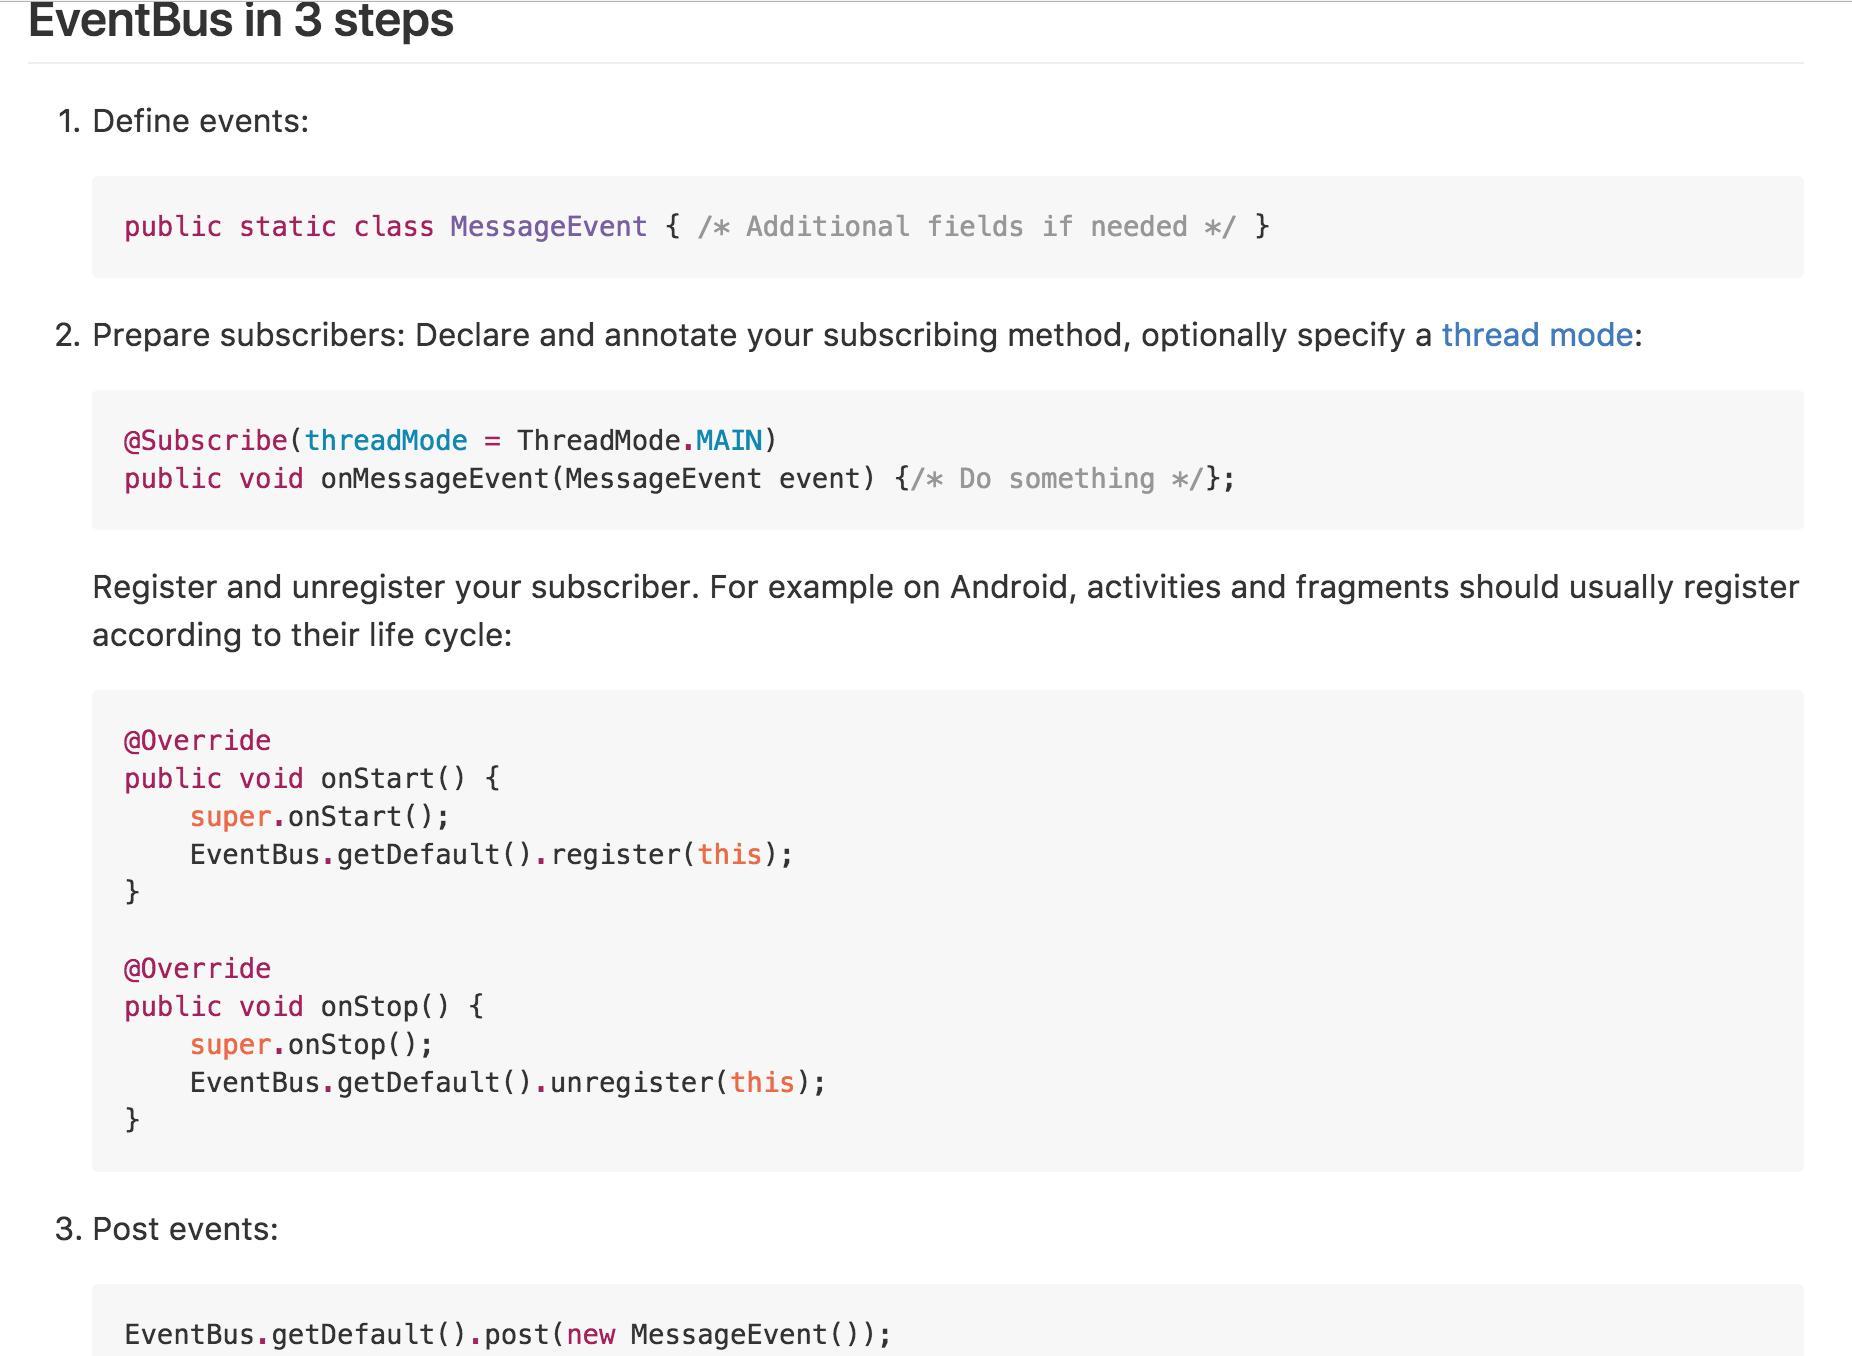 EventBus 3 0 source code analysis - Programmer Sought